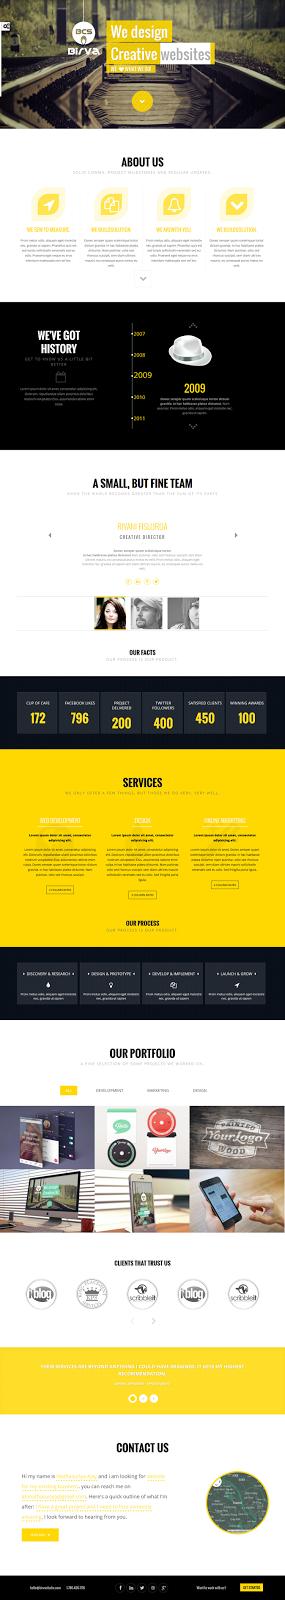 Premium One Page Joomla Template